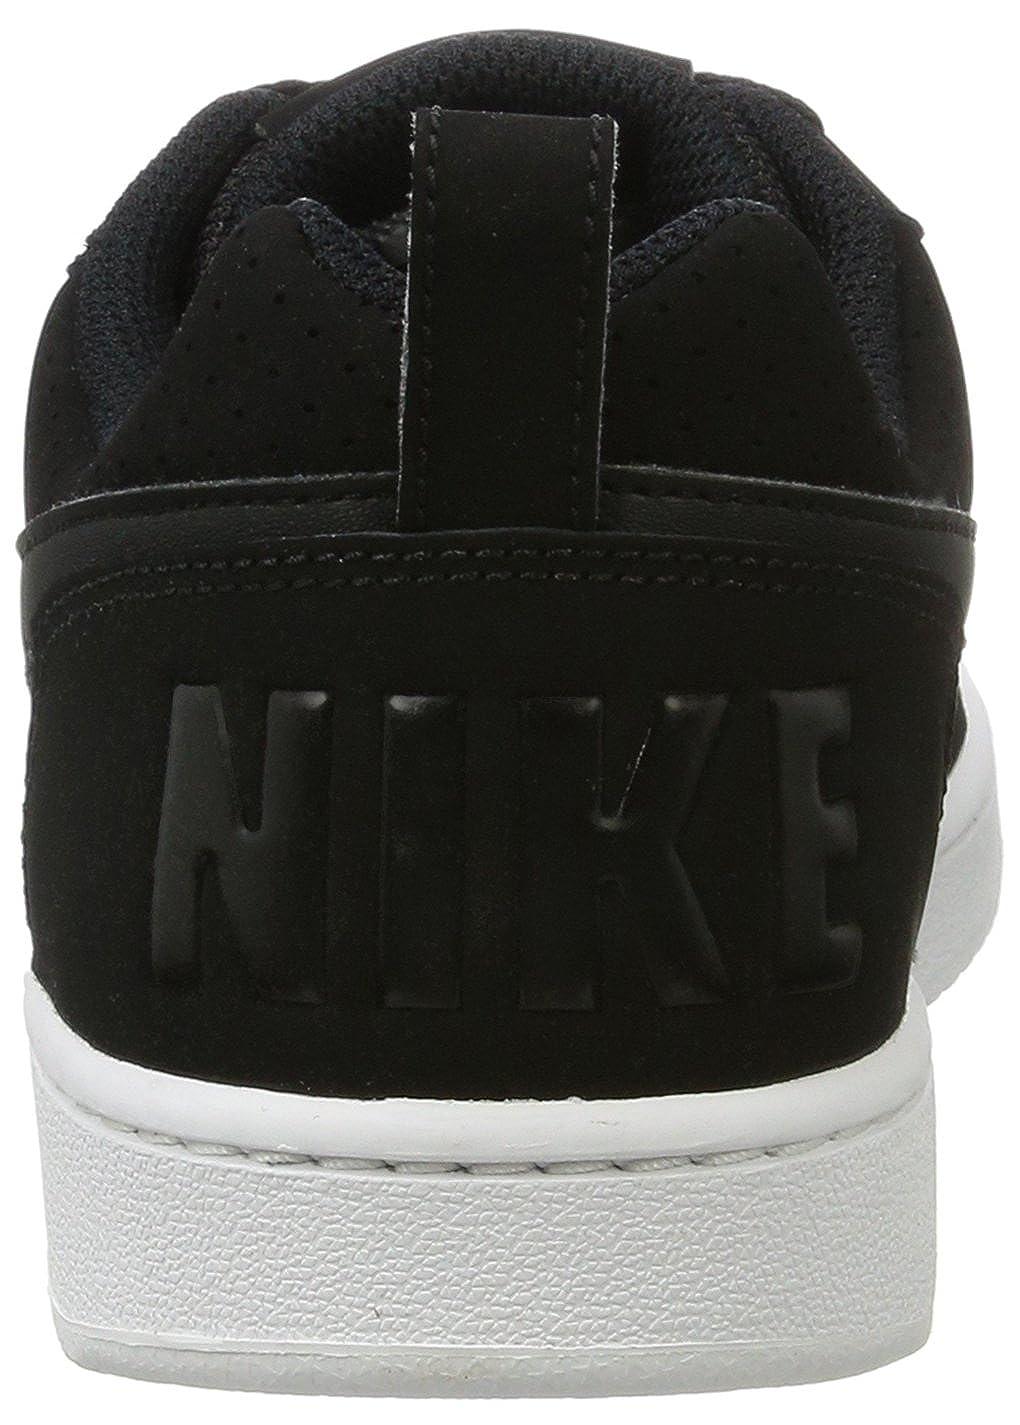 Nike Damen Court BGoldugh Low Basketballschuhe B01DJNMIHC Basketballschuhe Abholung in in in der Boutique 89f2de